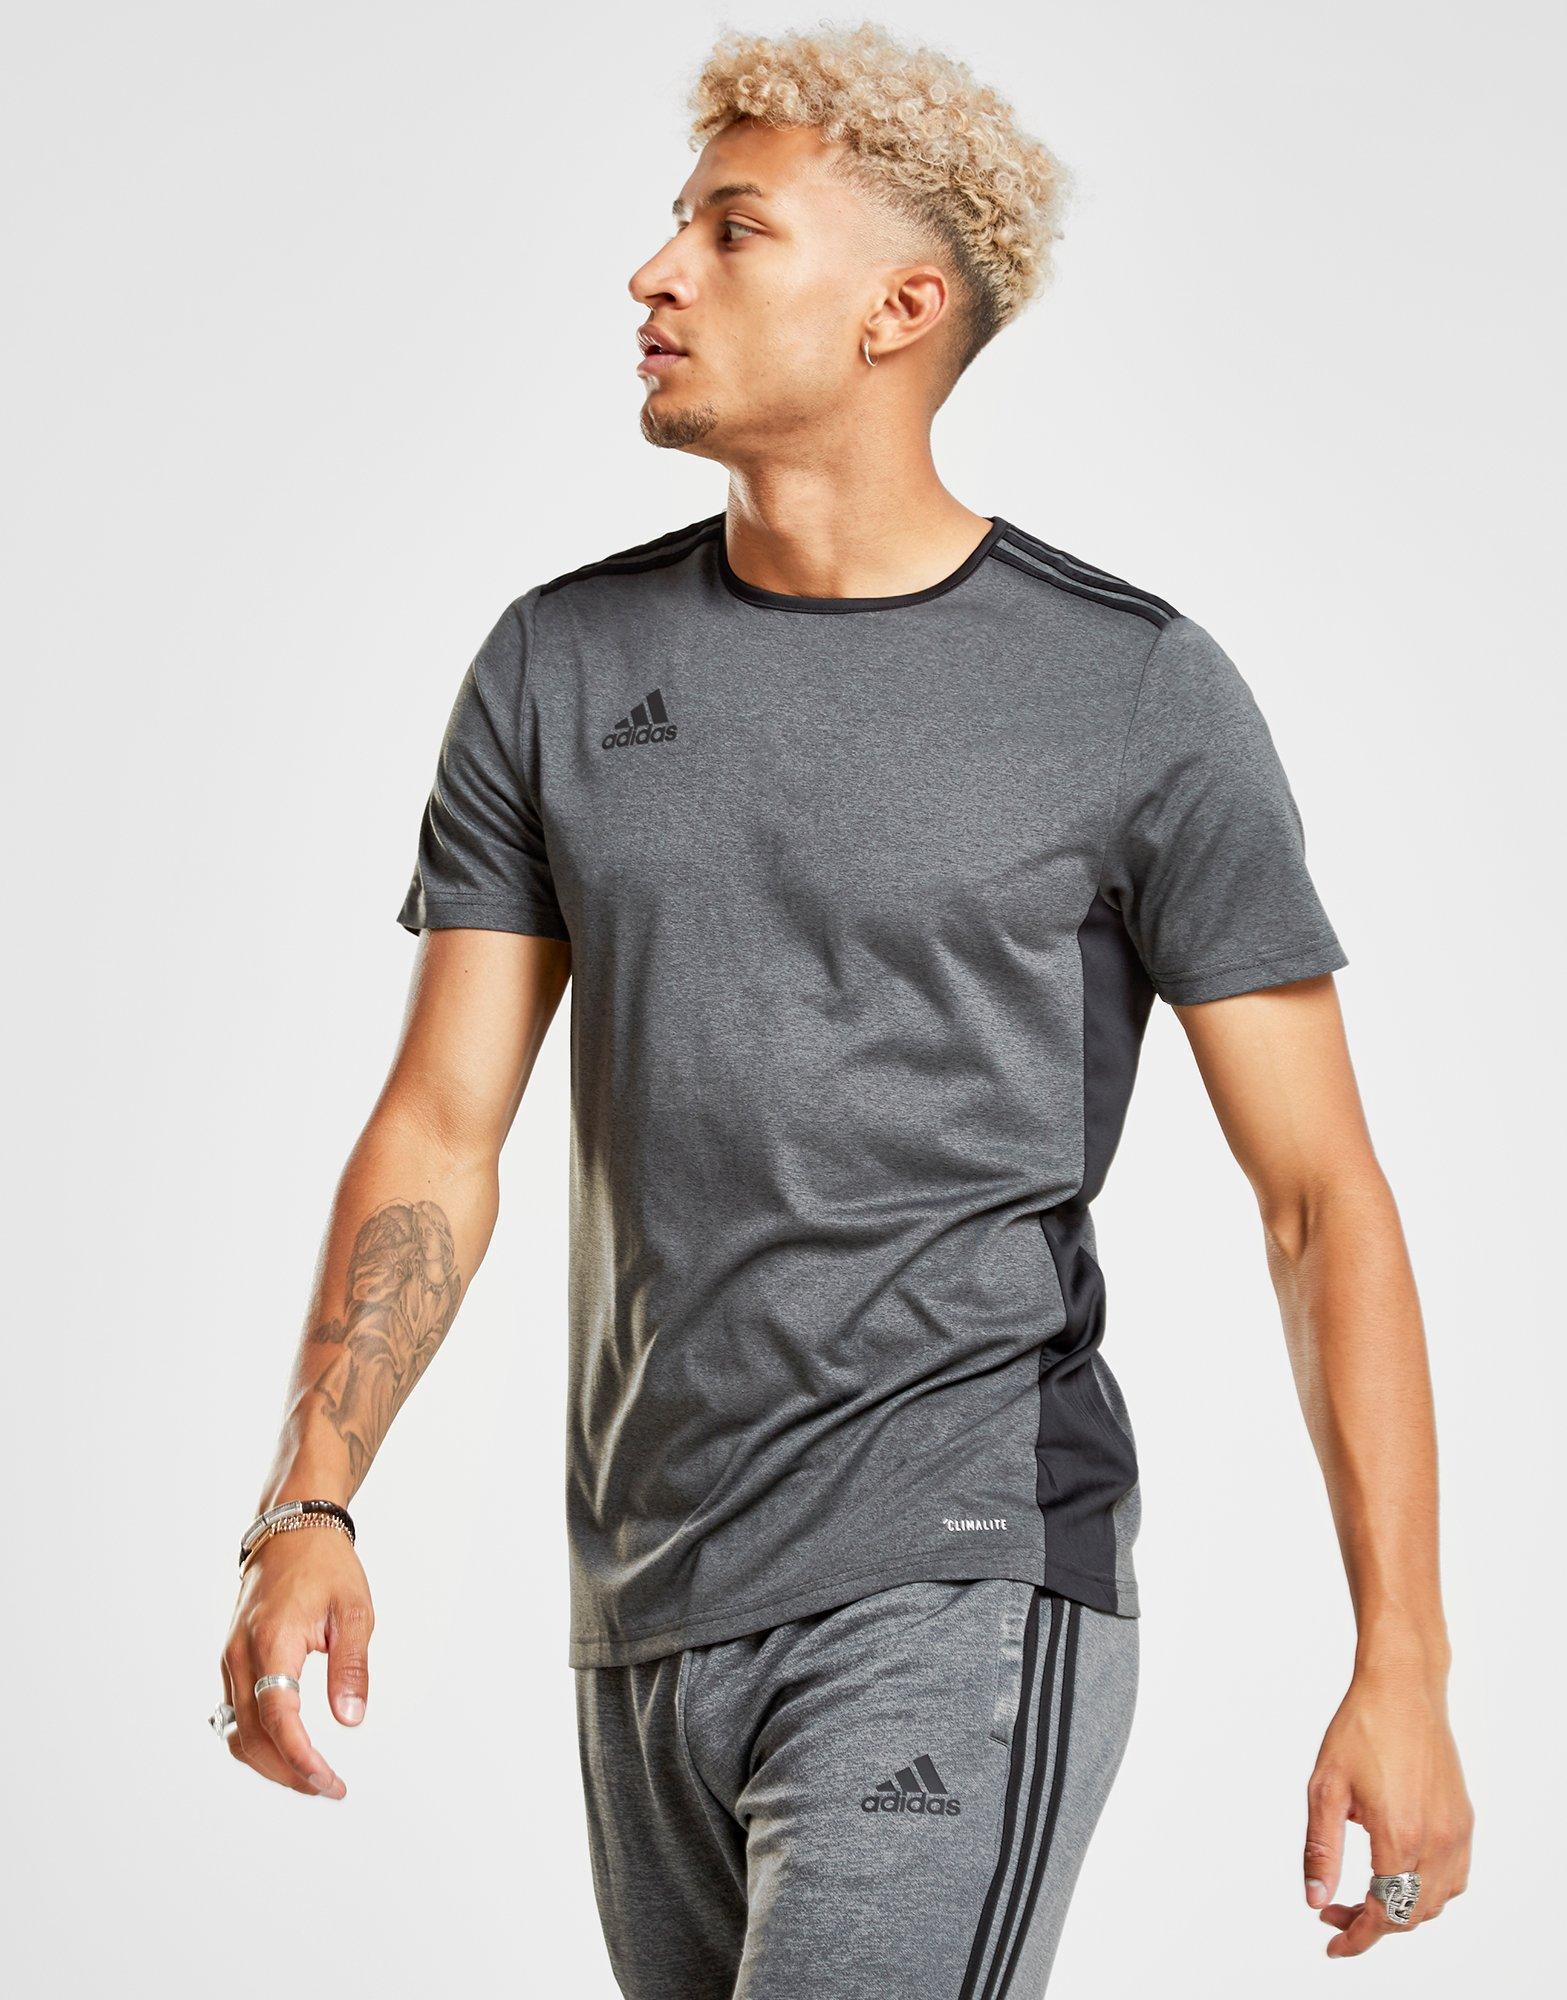 89cb2c68735 Adidas - Gray Entrada 18 T-shirt for Men - Lyst. View fullscreen